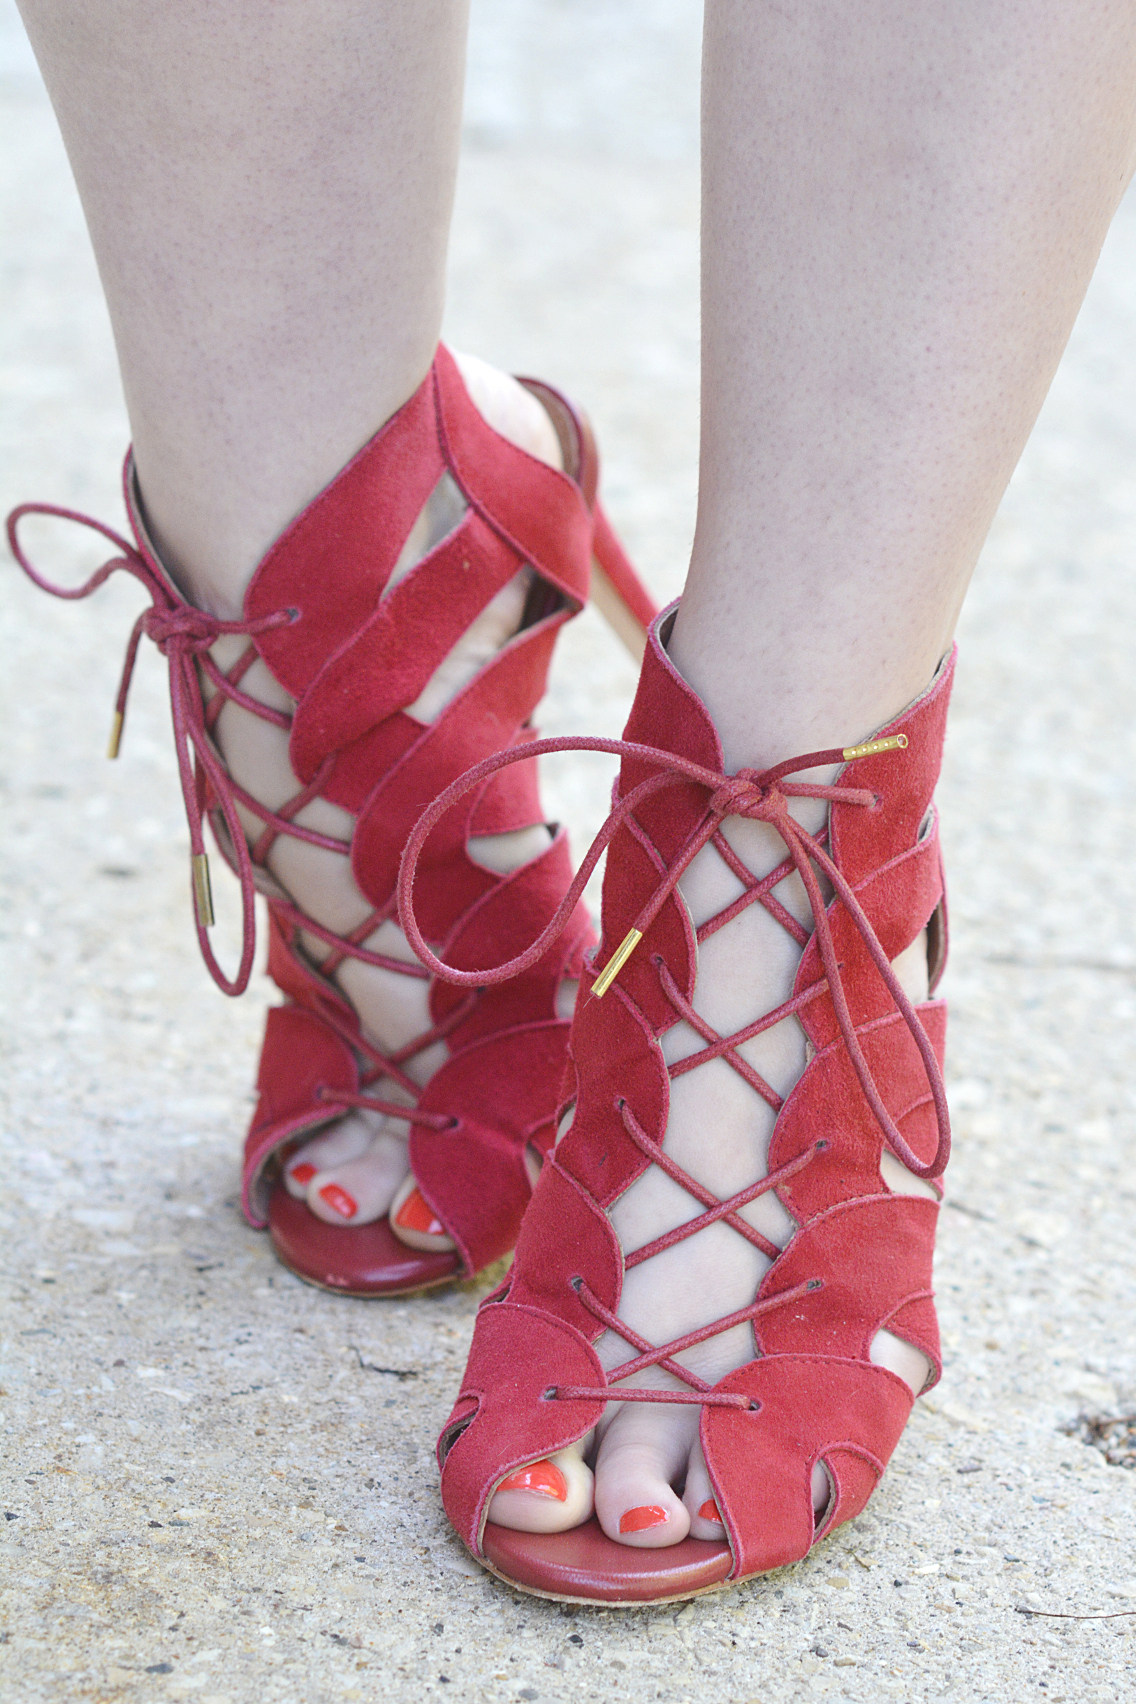 Joie Bonnie Lace Up Red Suede Sandals